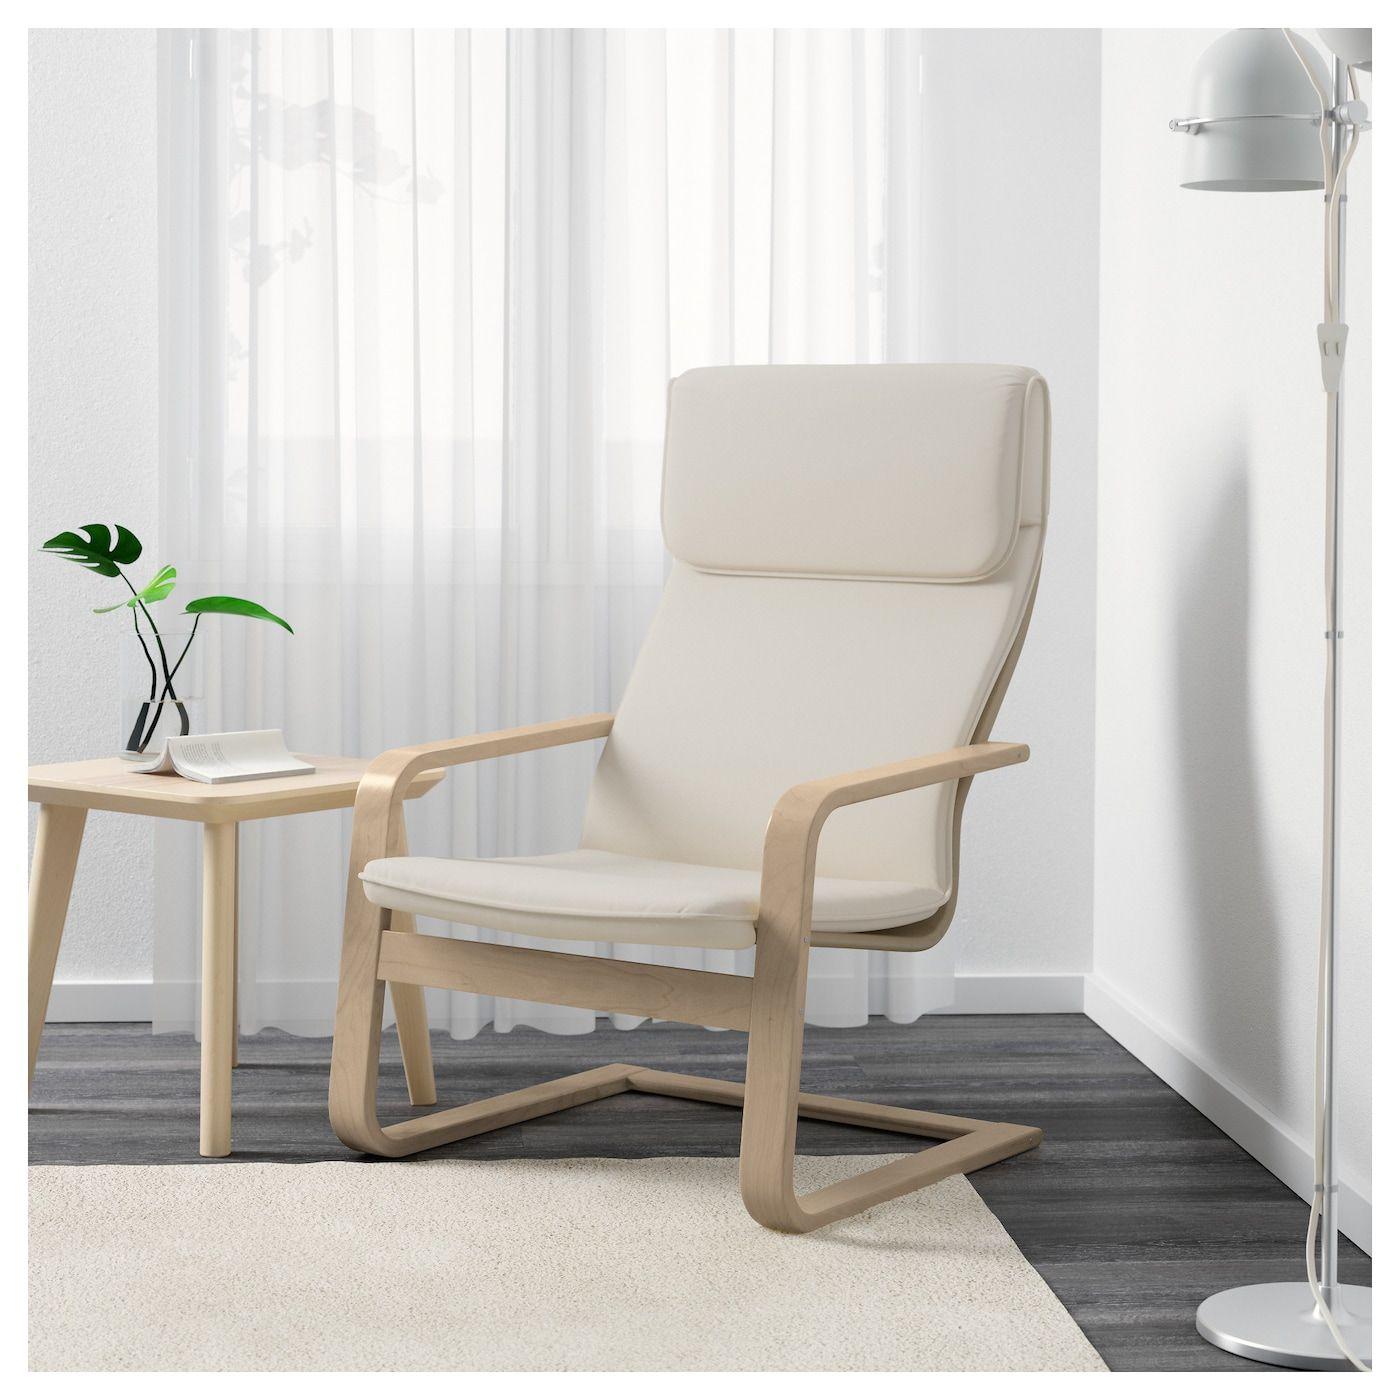 Altalena Giardino Ikea poltrona sedia a dondolo ikea